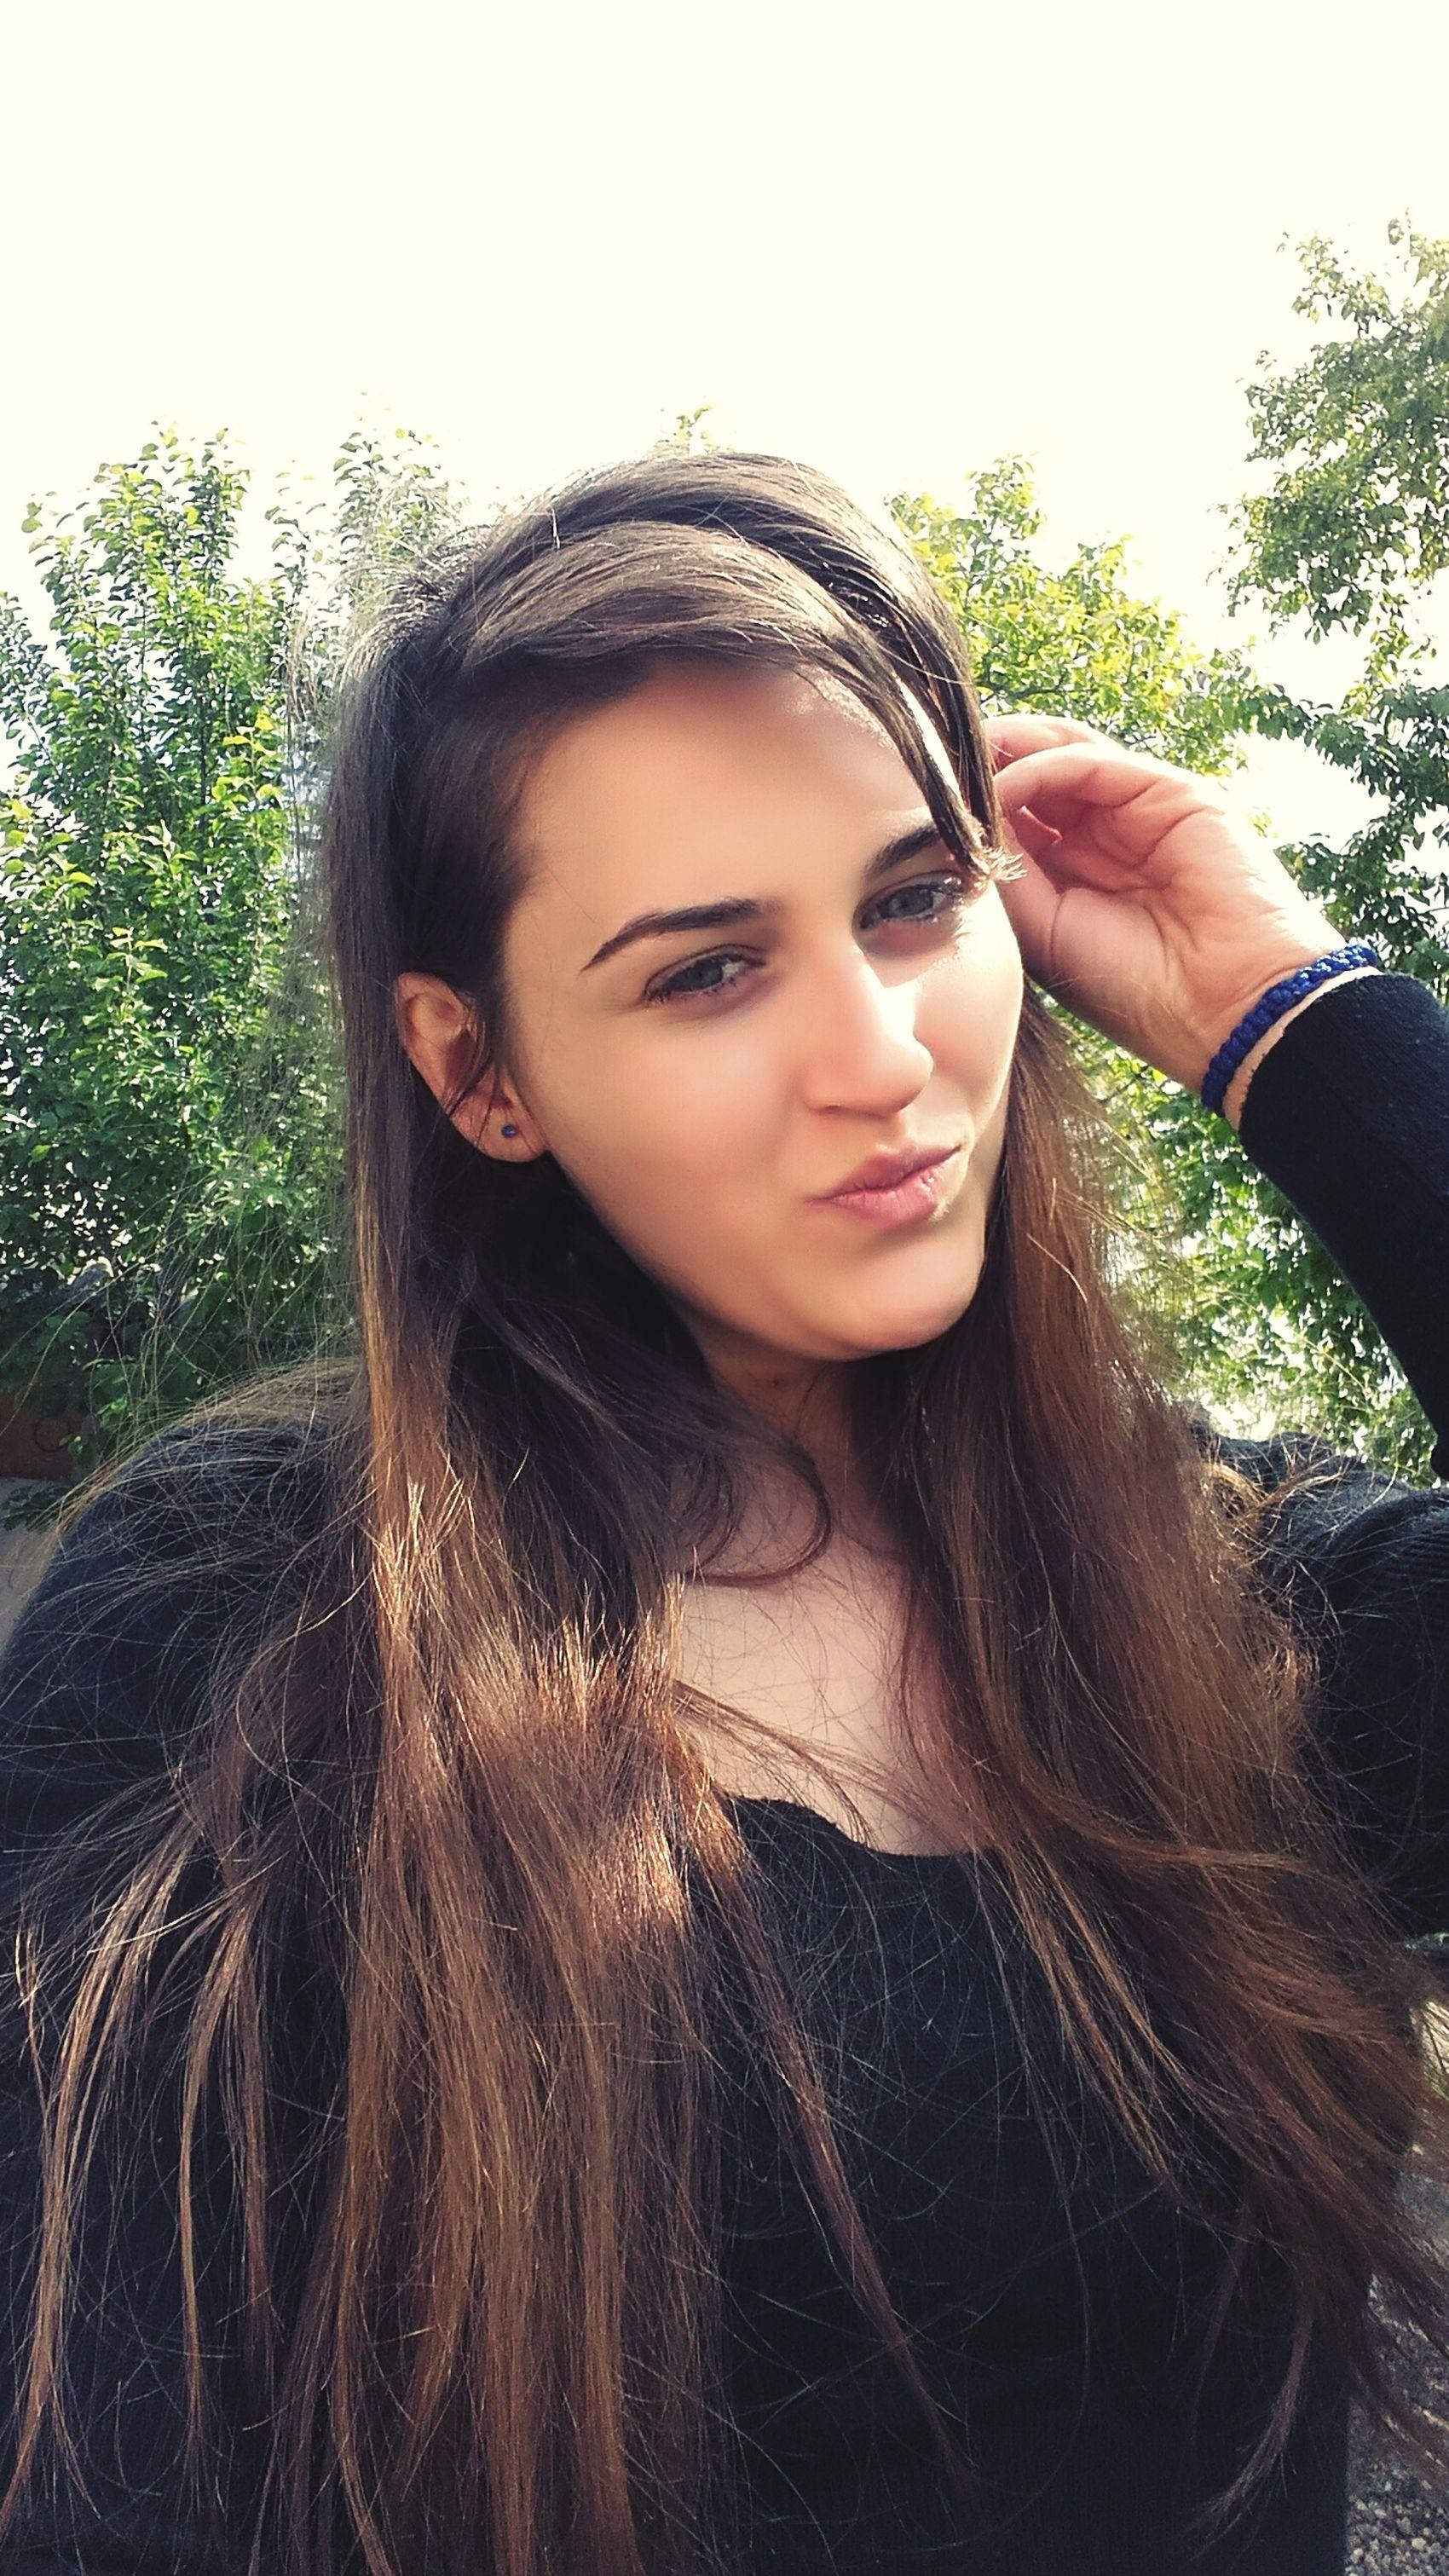 Mee My Lips 💋 My Green Eyes:) My Hair Black My Face >< My Kiss =Yo World My Happiness ❤